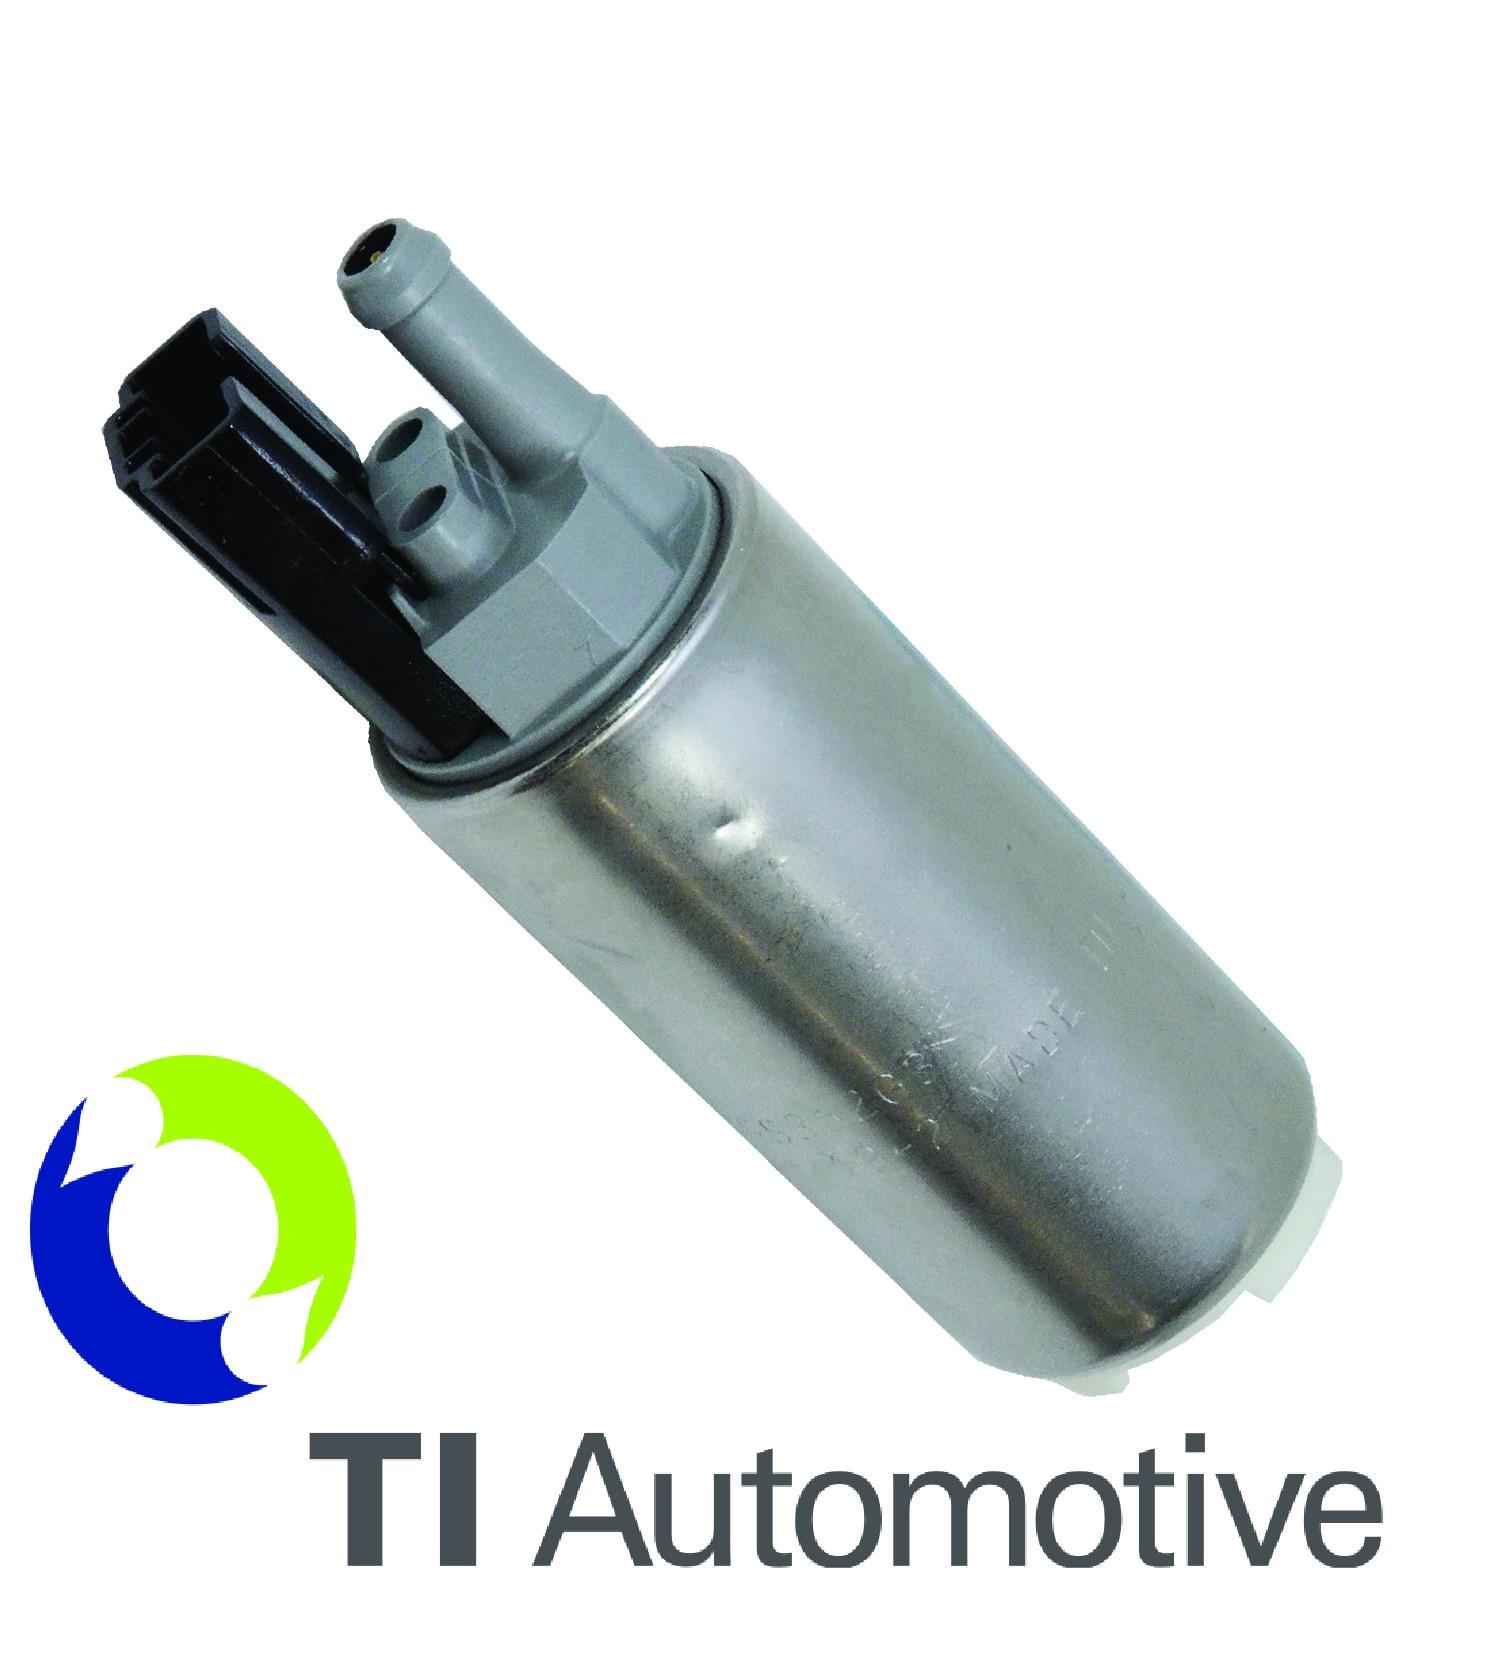 Ti Automotive (Walbro) 350 lph In-Tank Motorsport Fuel Pumps